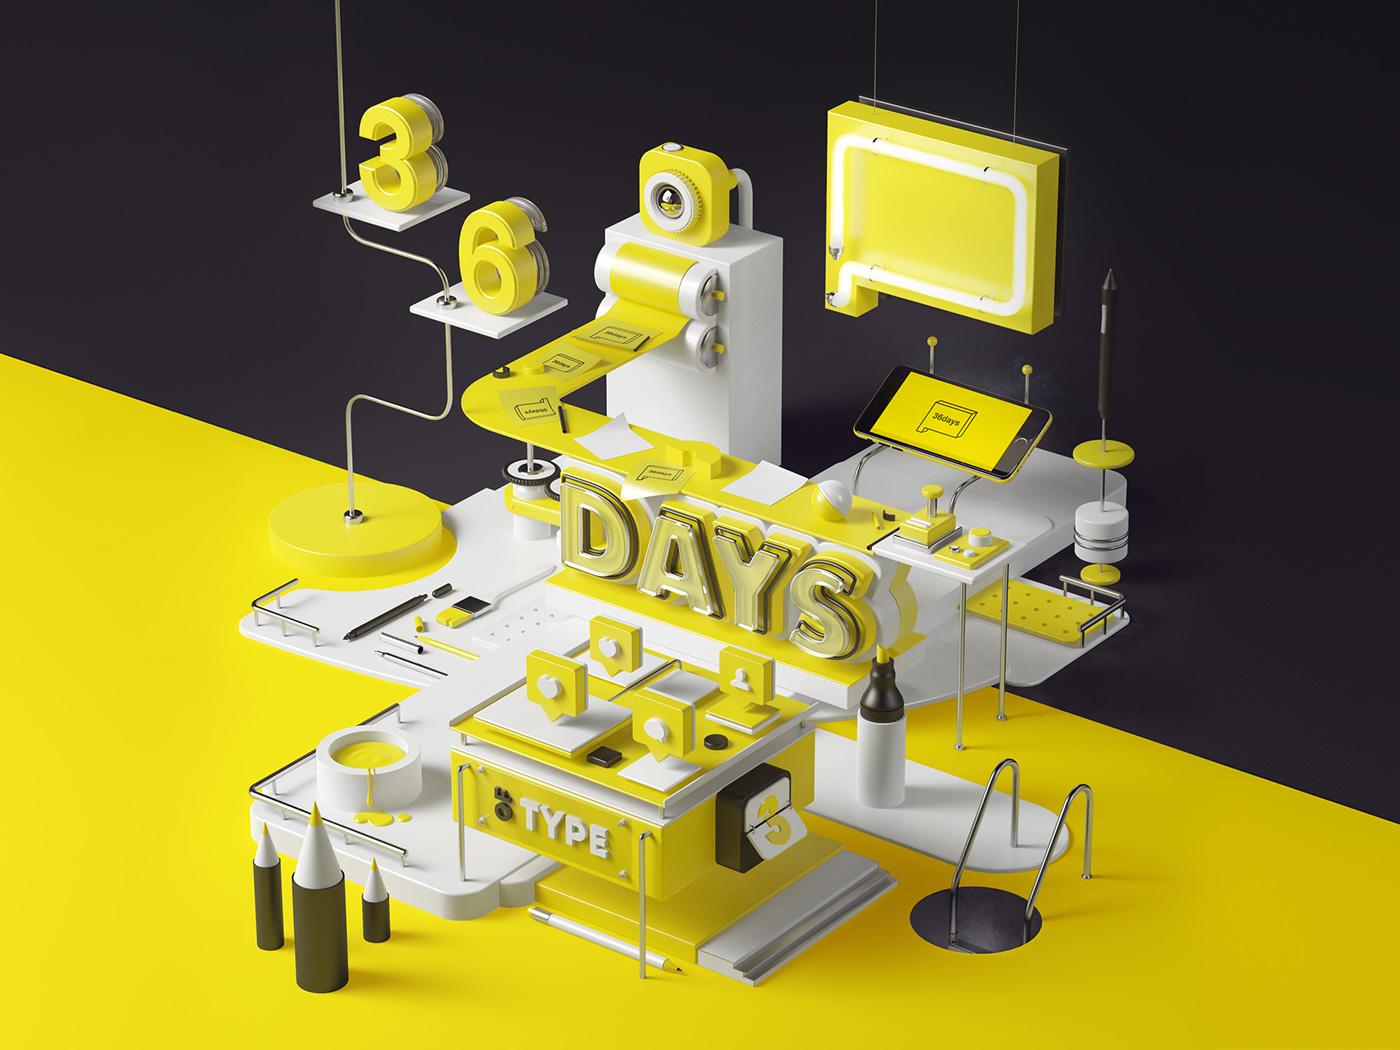 36daysoftype,c4d,vray,yellow